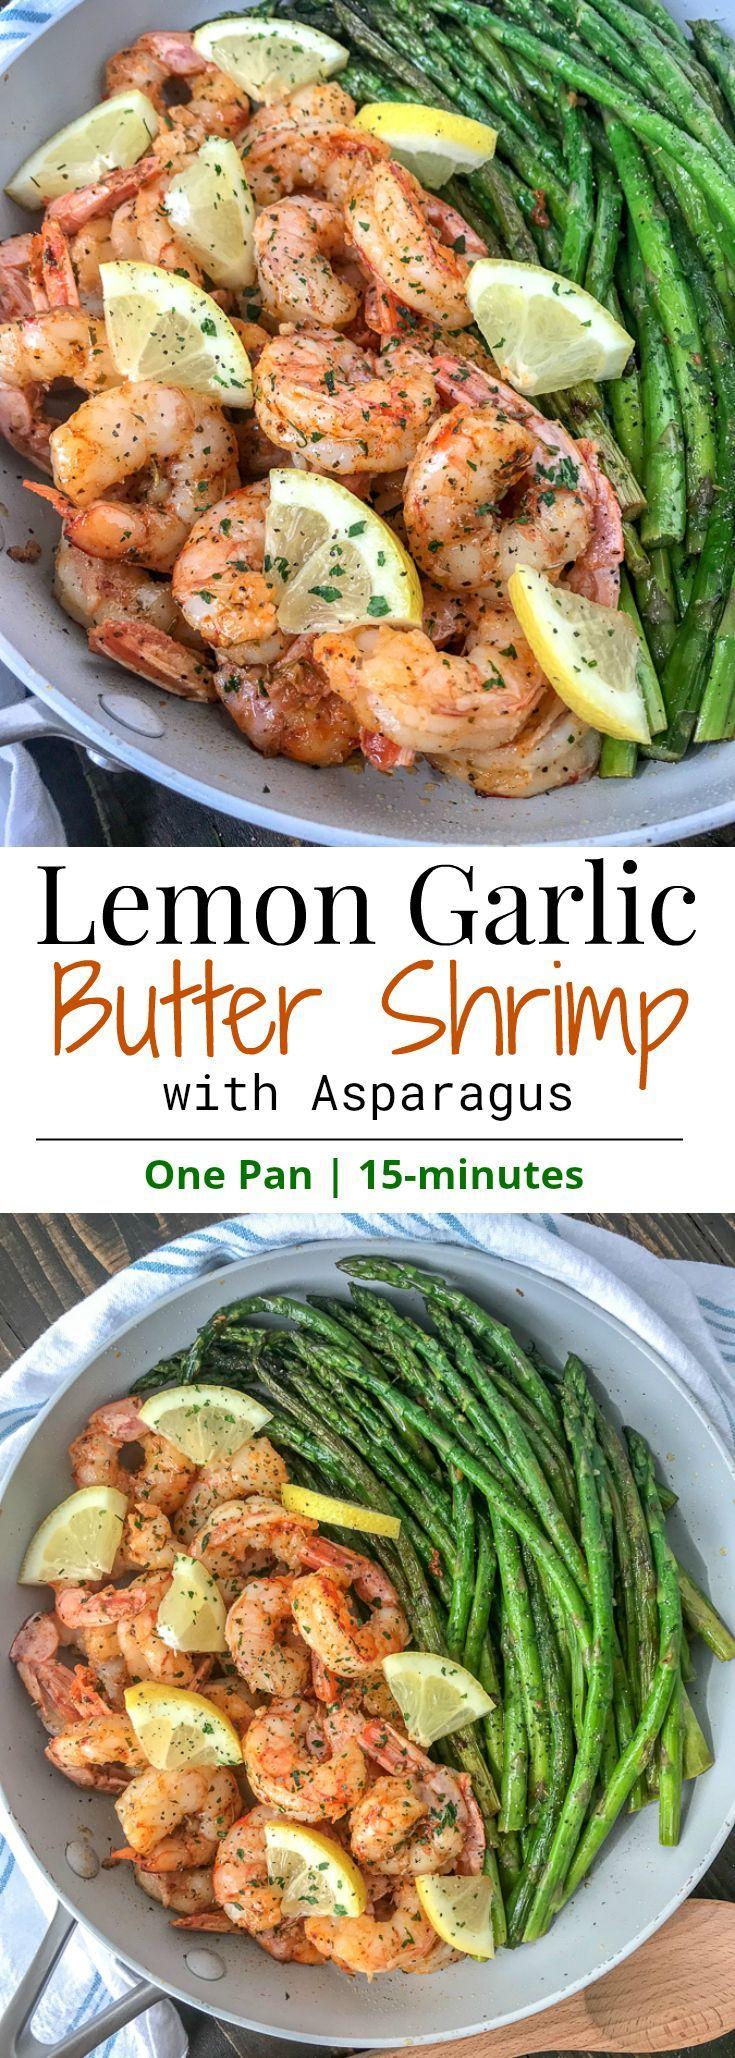 Lemon Garlic Butter Shrimp with Asparagus #healthyfood